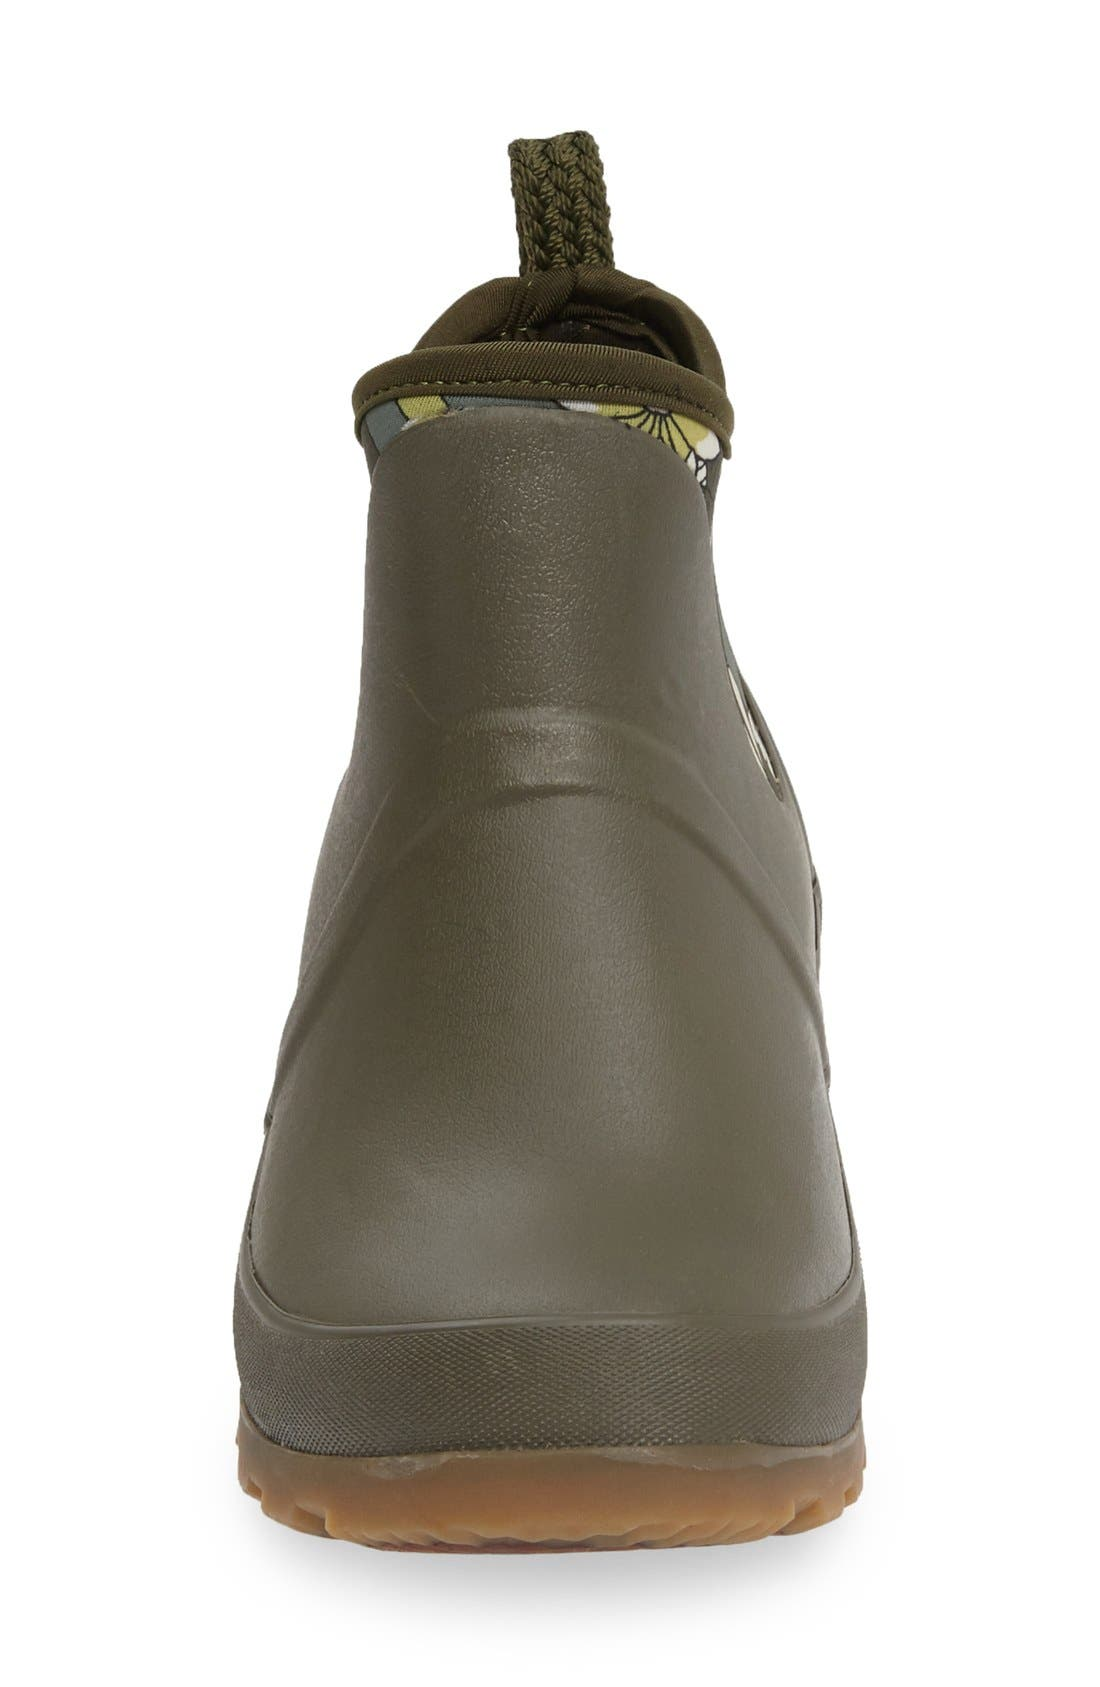 Mano Waterproof Rain Boot,                             Alternate thumbnail 3, color,                             Olive Flower Power